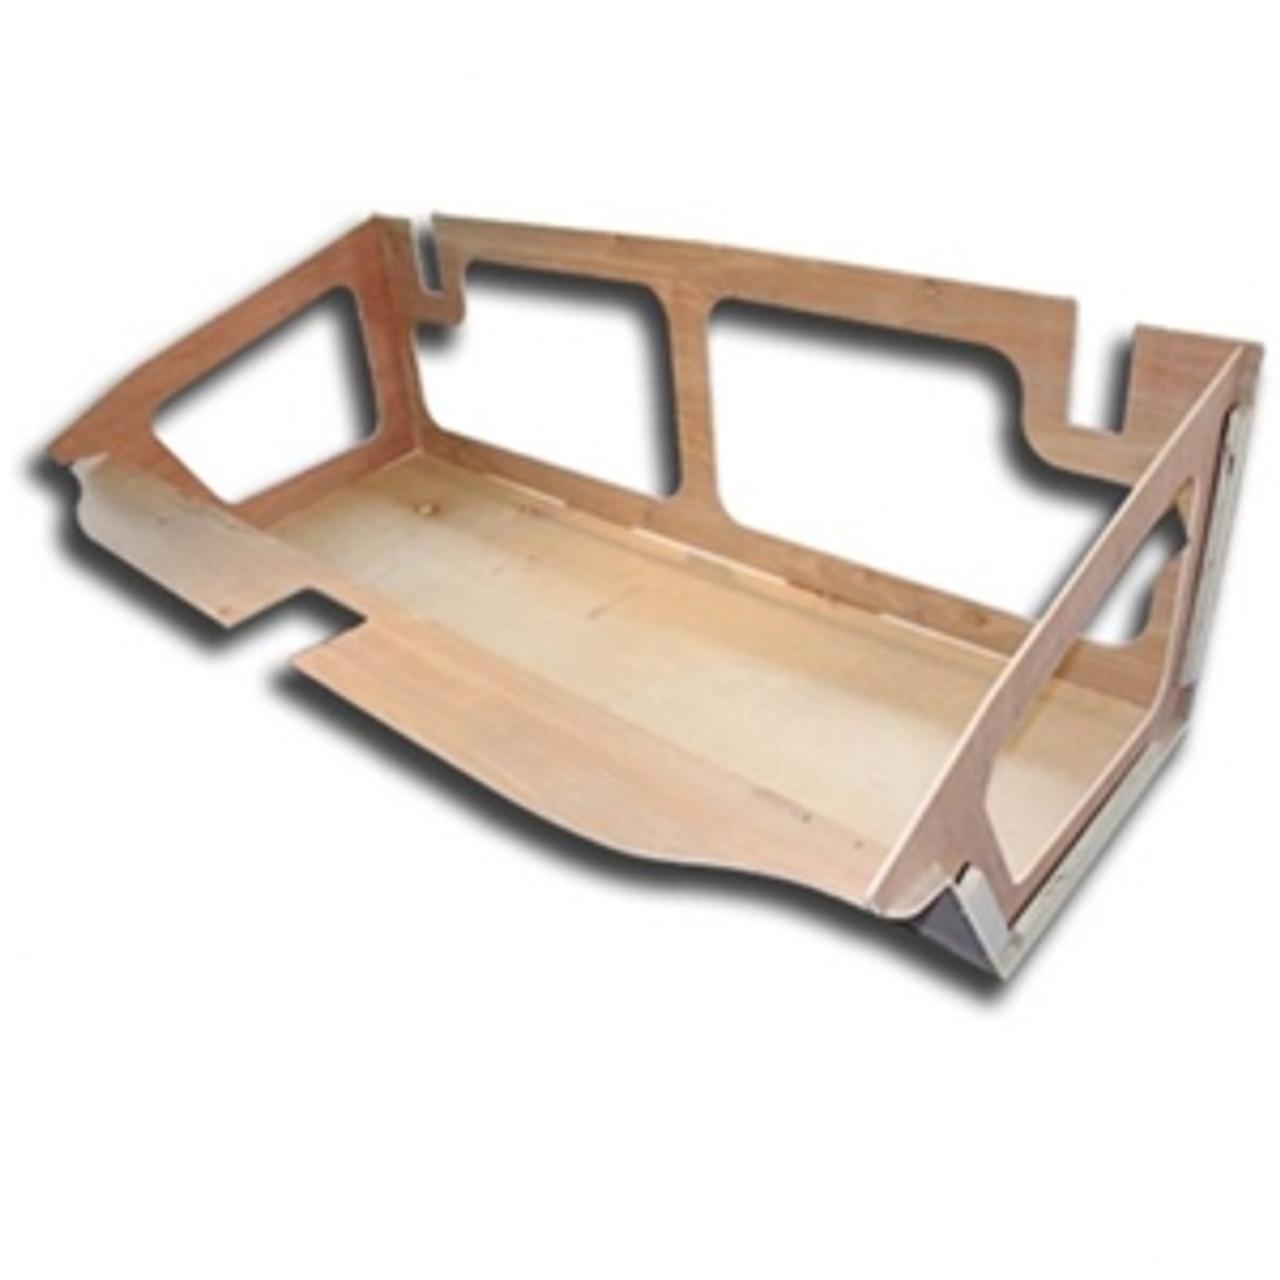 1970-72 Trunk Panel (kit)